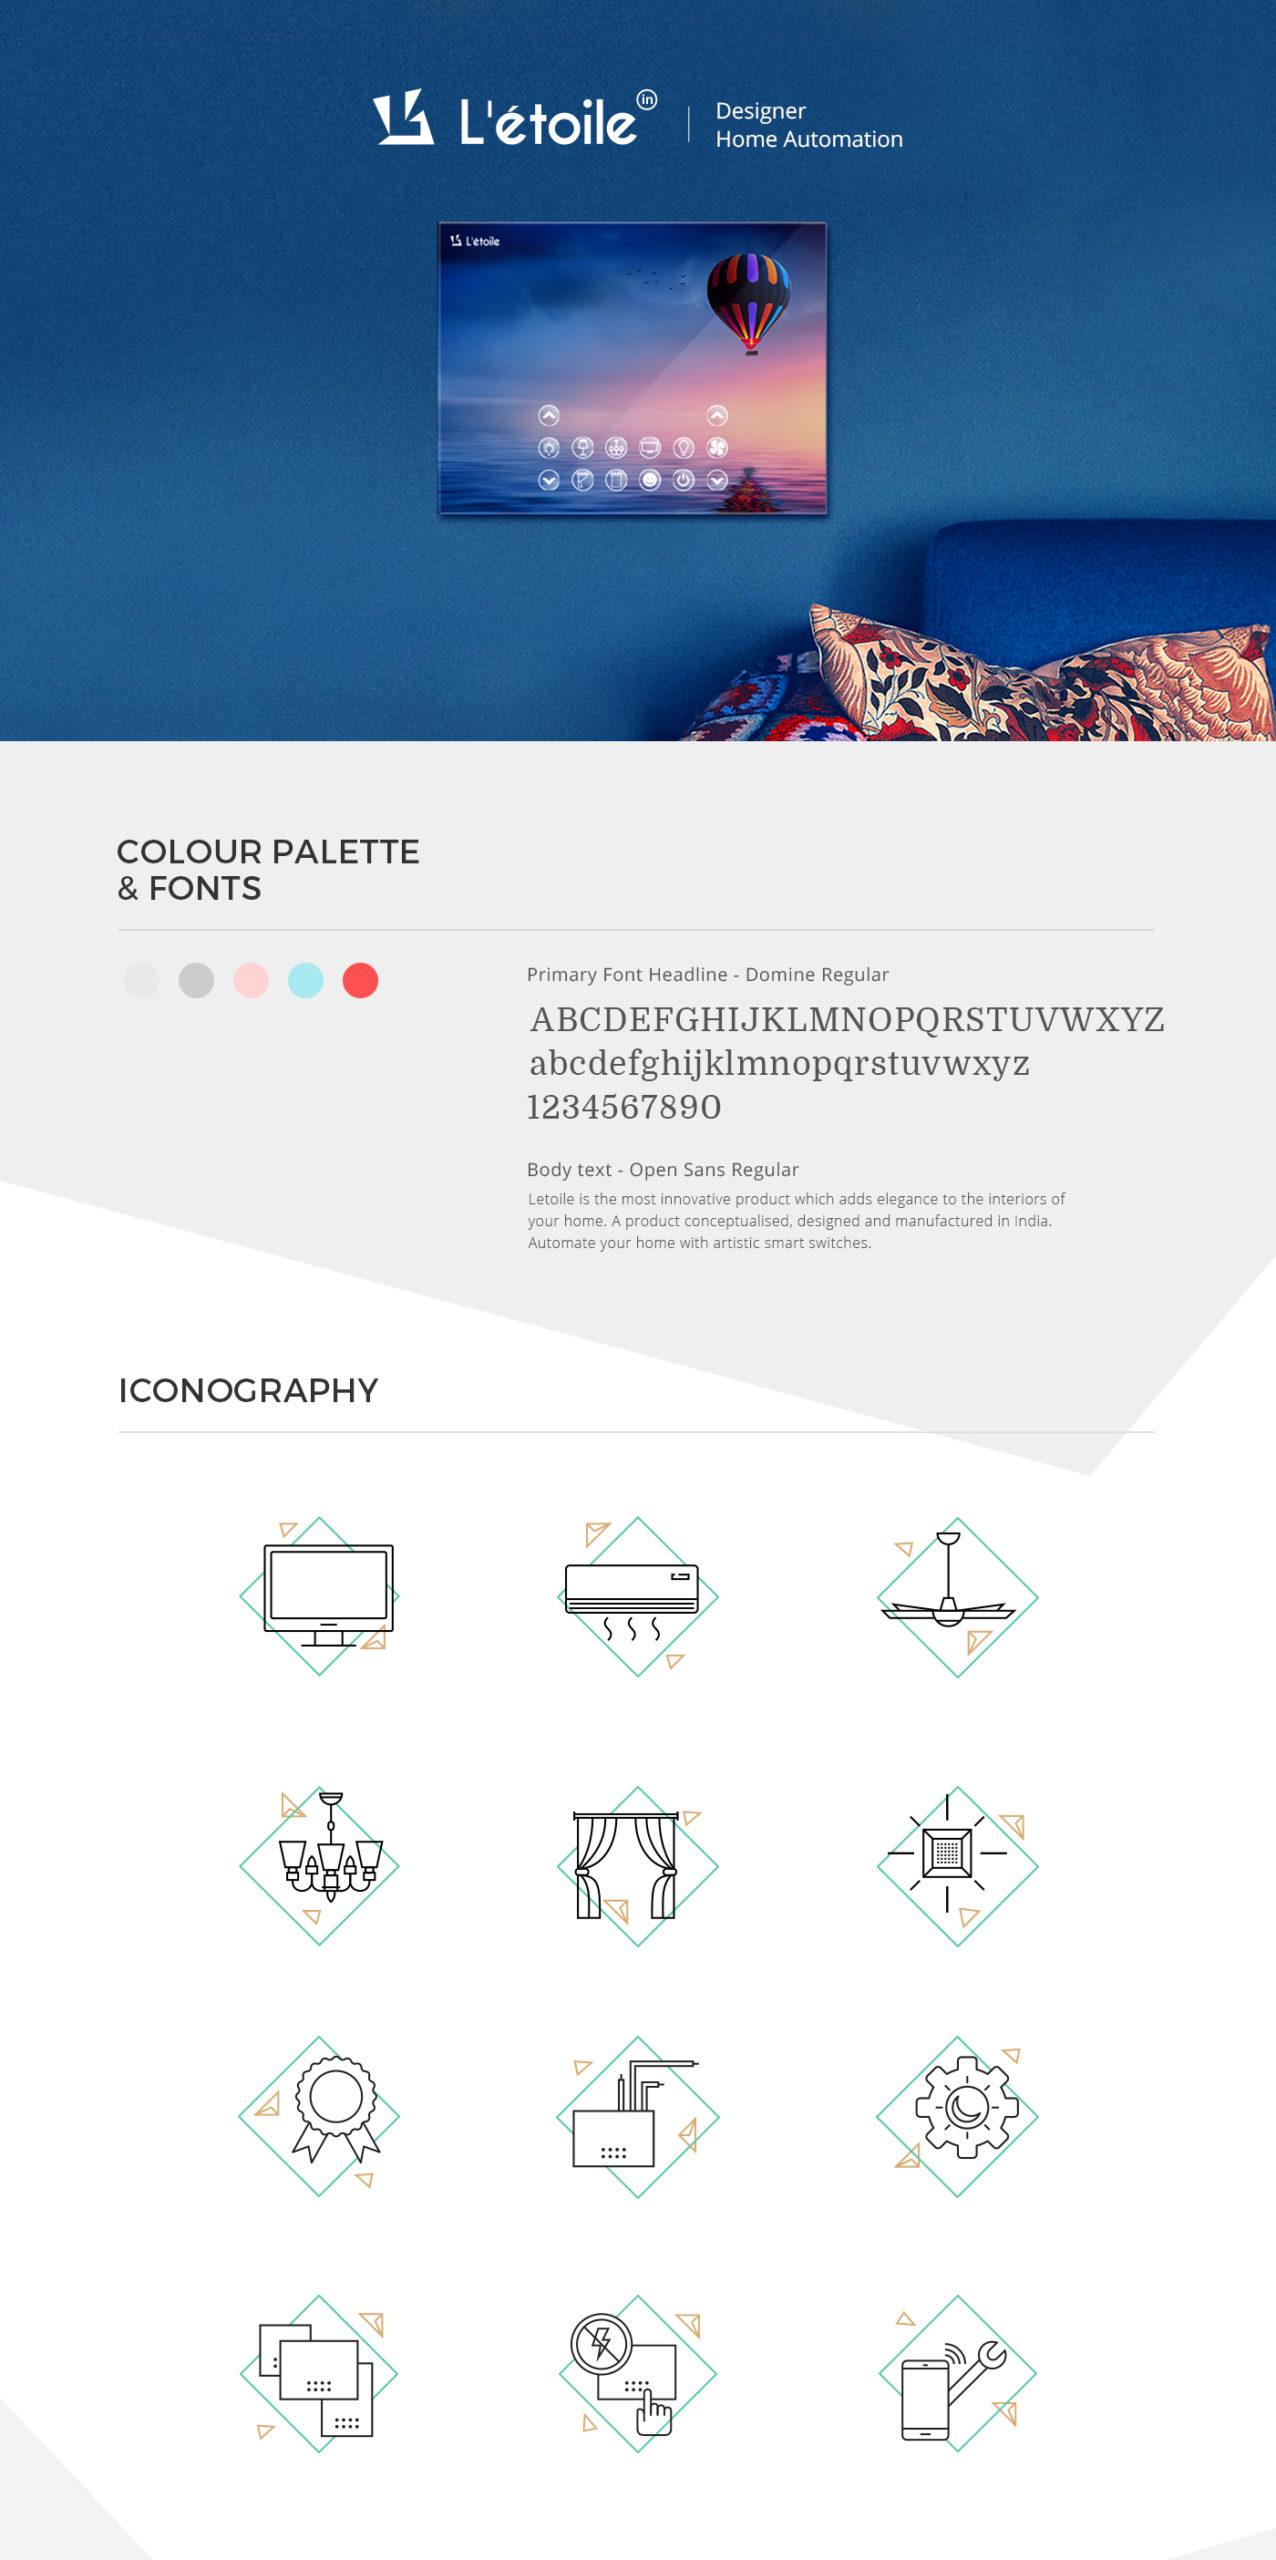 Letoile website iconography